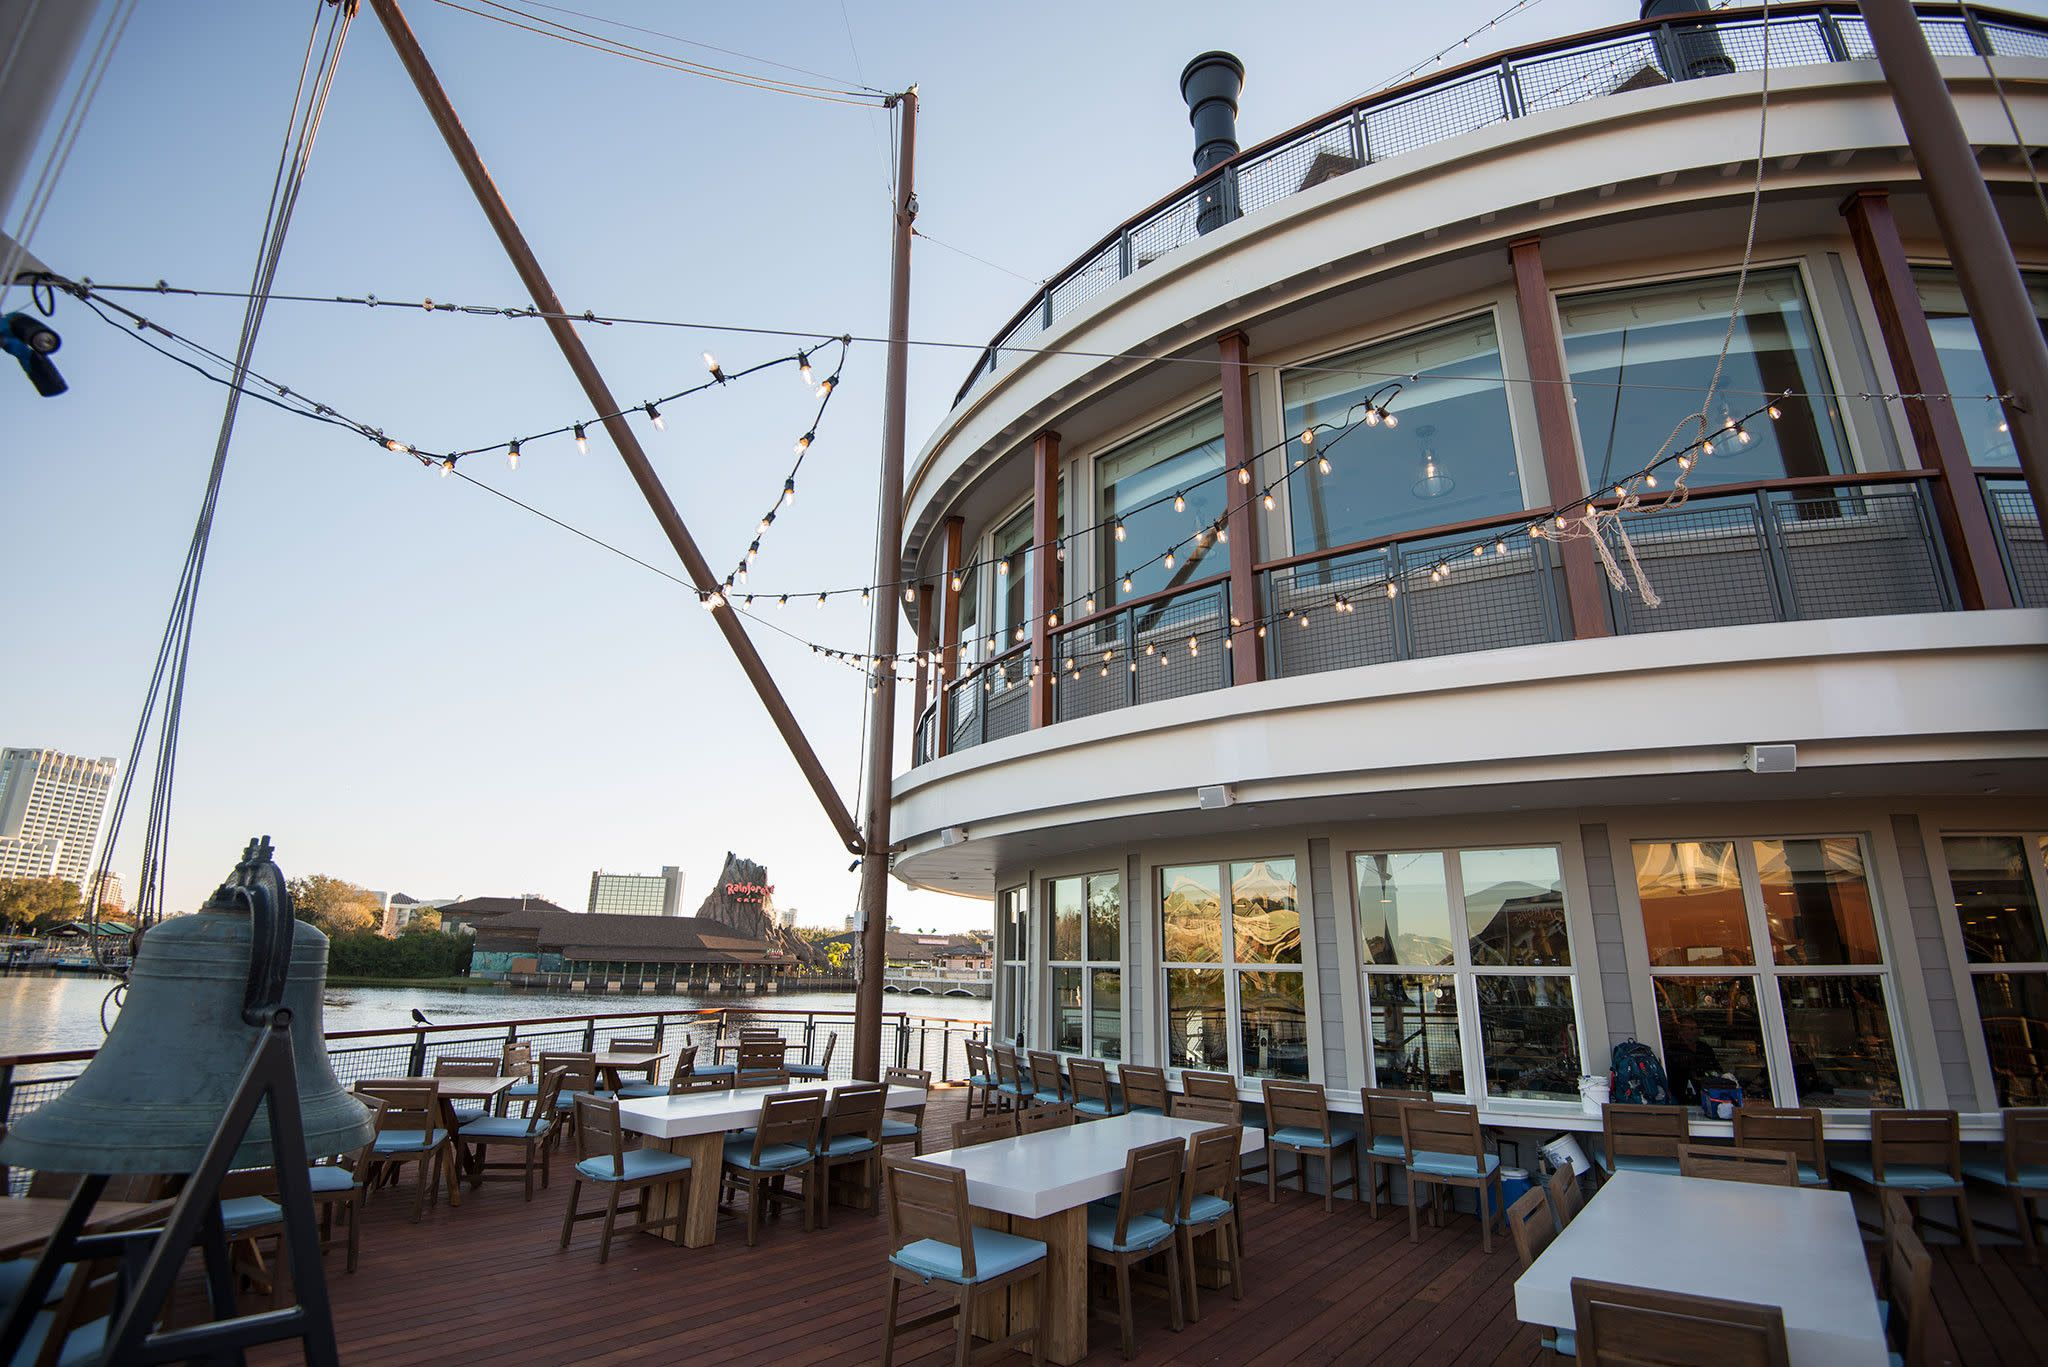 Paddlefish Restaurant-180040_1st_deck_bow.jpg